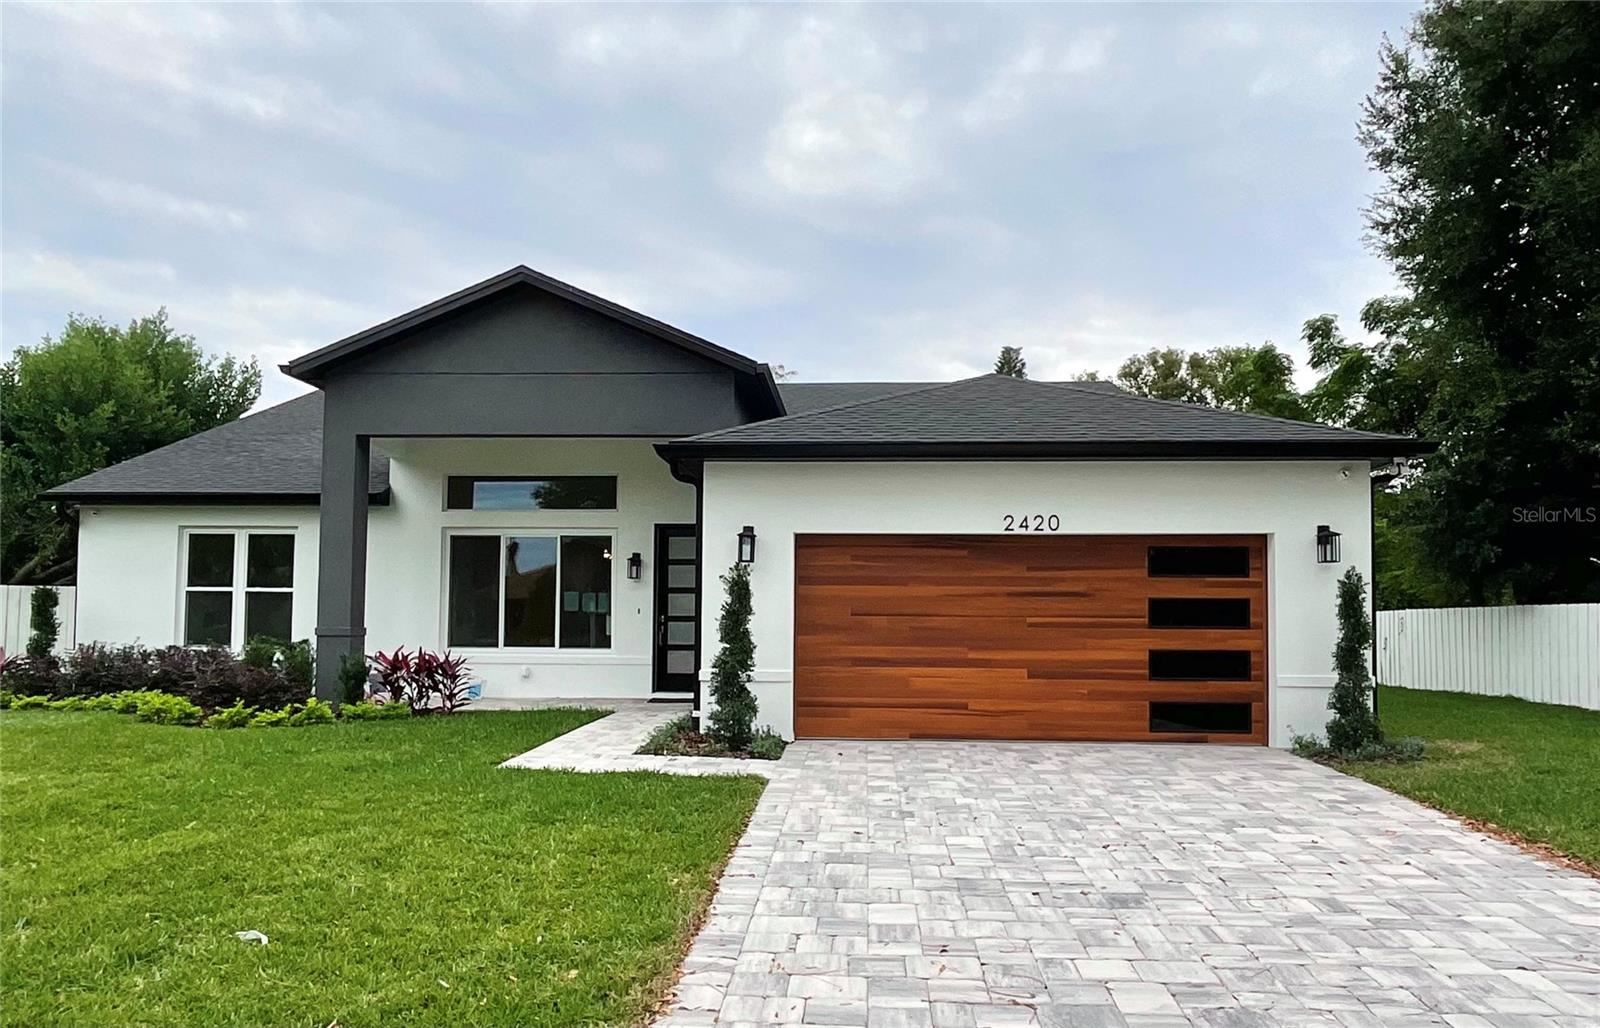 2420 SALISBURY BOULEVARD, Winter Park, FL 32789 - #: O5947895